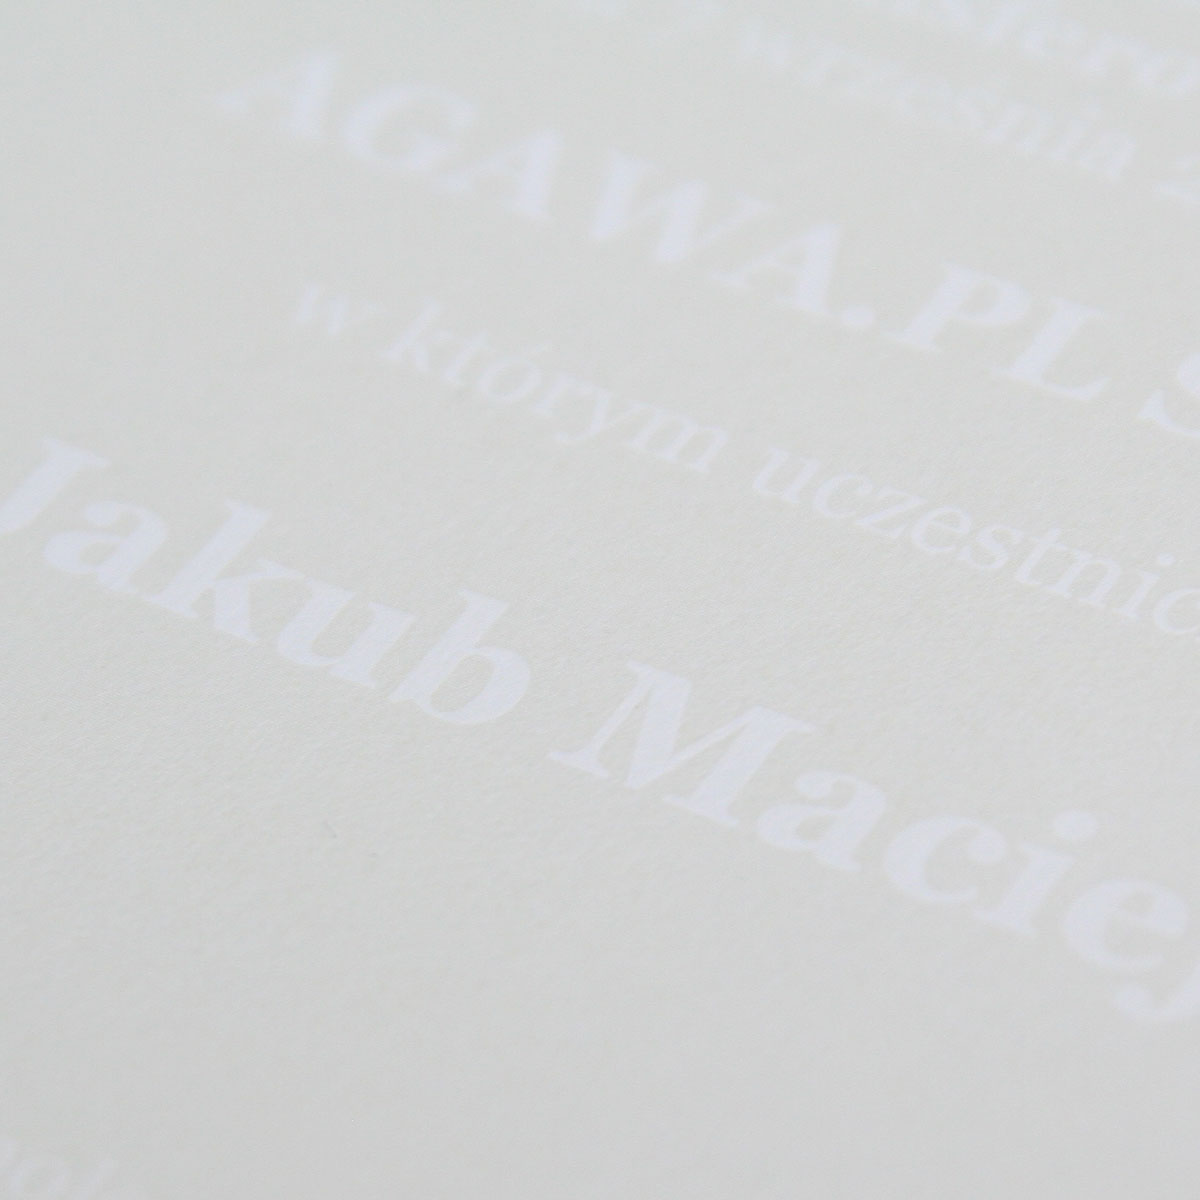 White Laser Toner cartridge HP CLJ CM 3530 Compatible